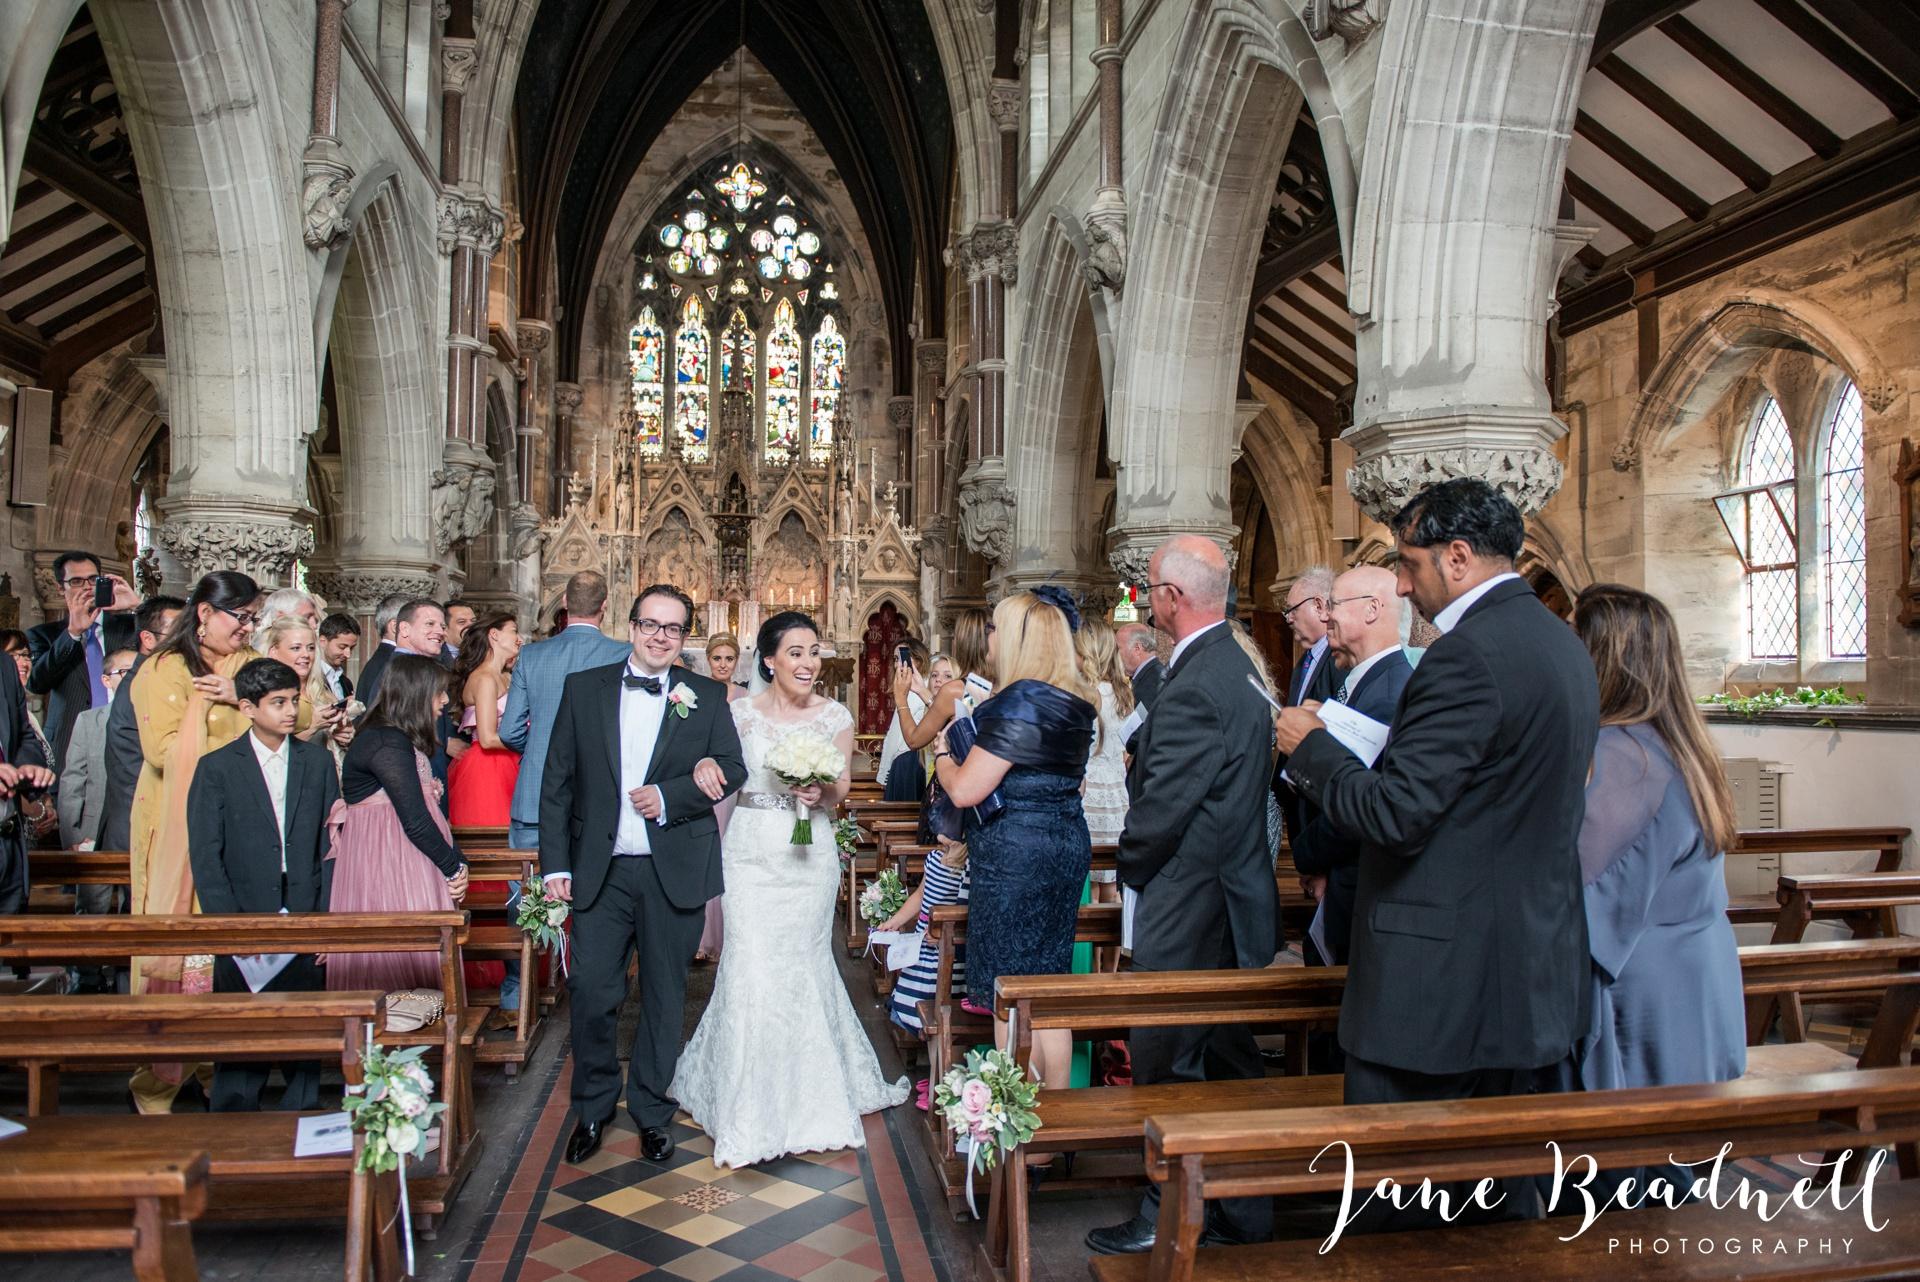 Jane Beadnell fine art wedding photographer Rudding Park Harrogate_0033